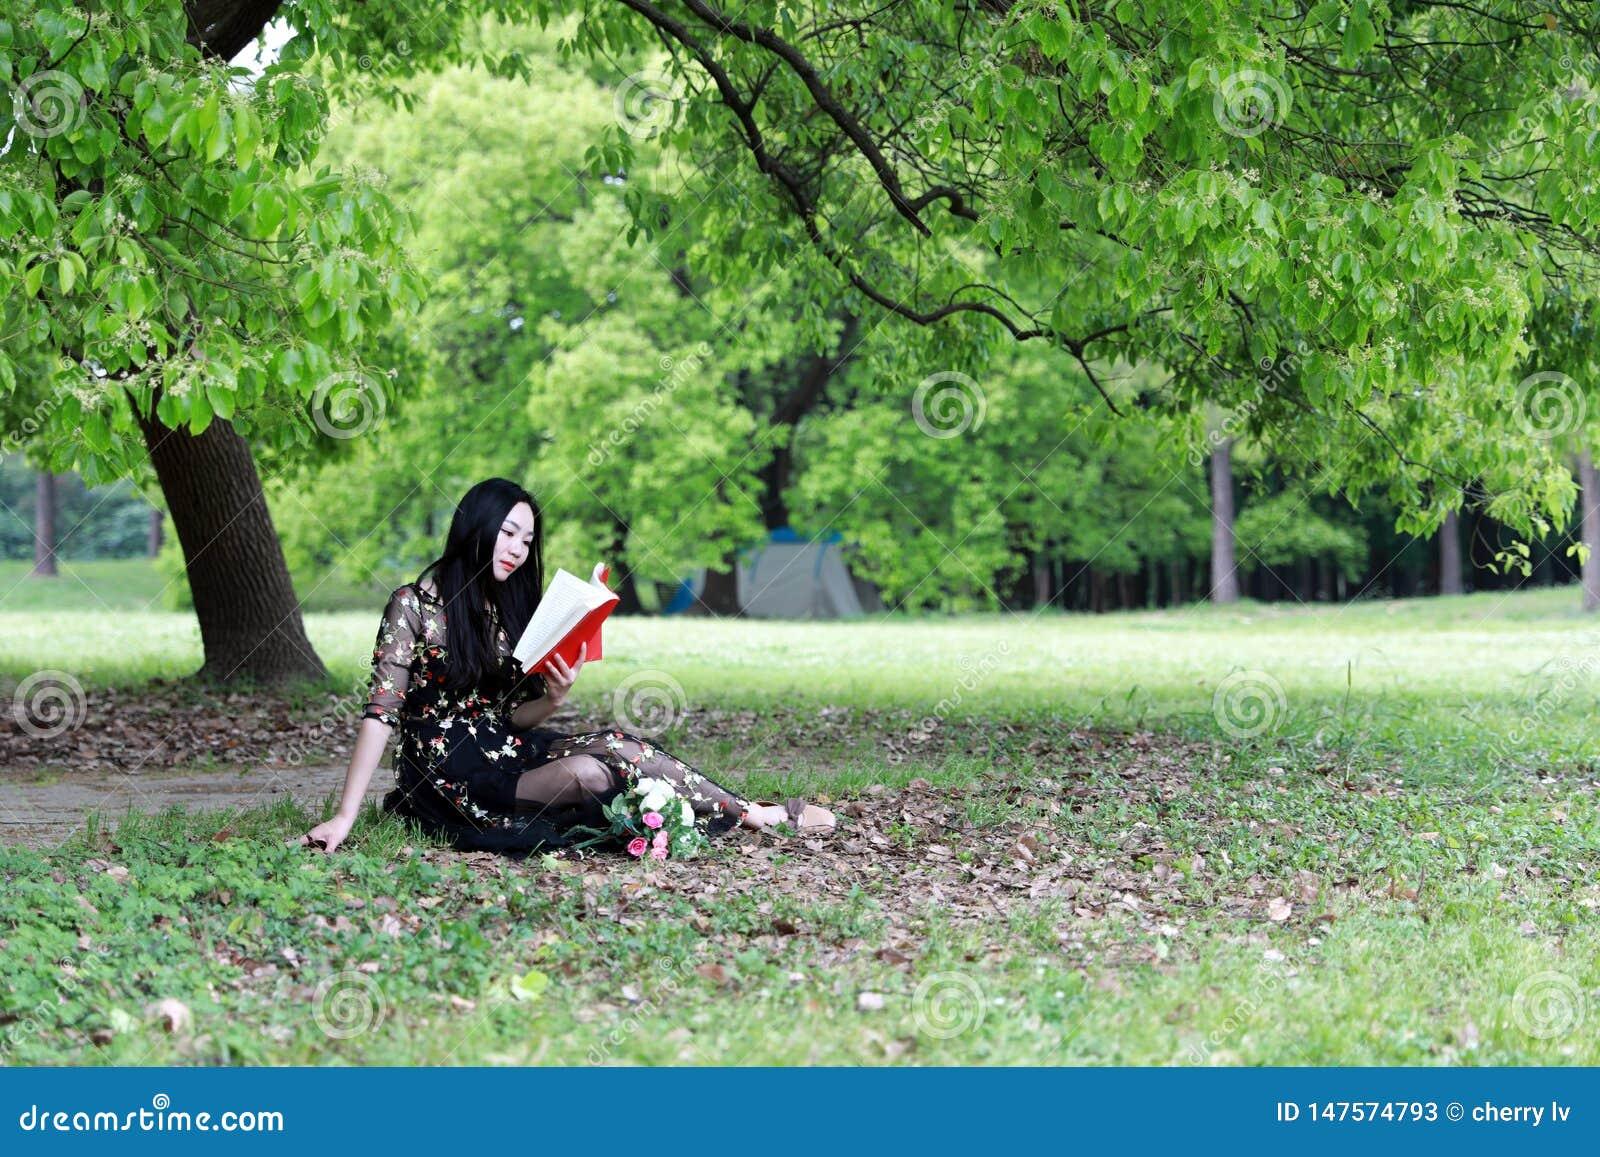 Sad Woman Sitting Under A Tree Stock Image - Image of